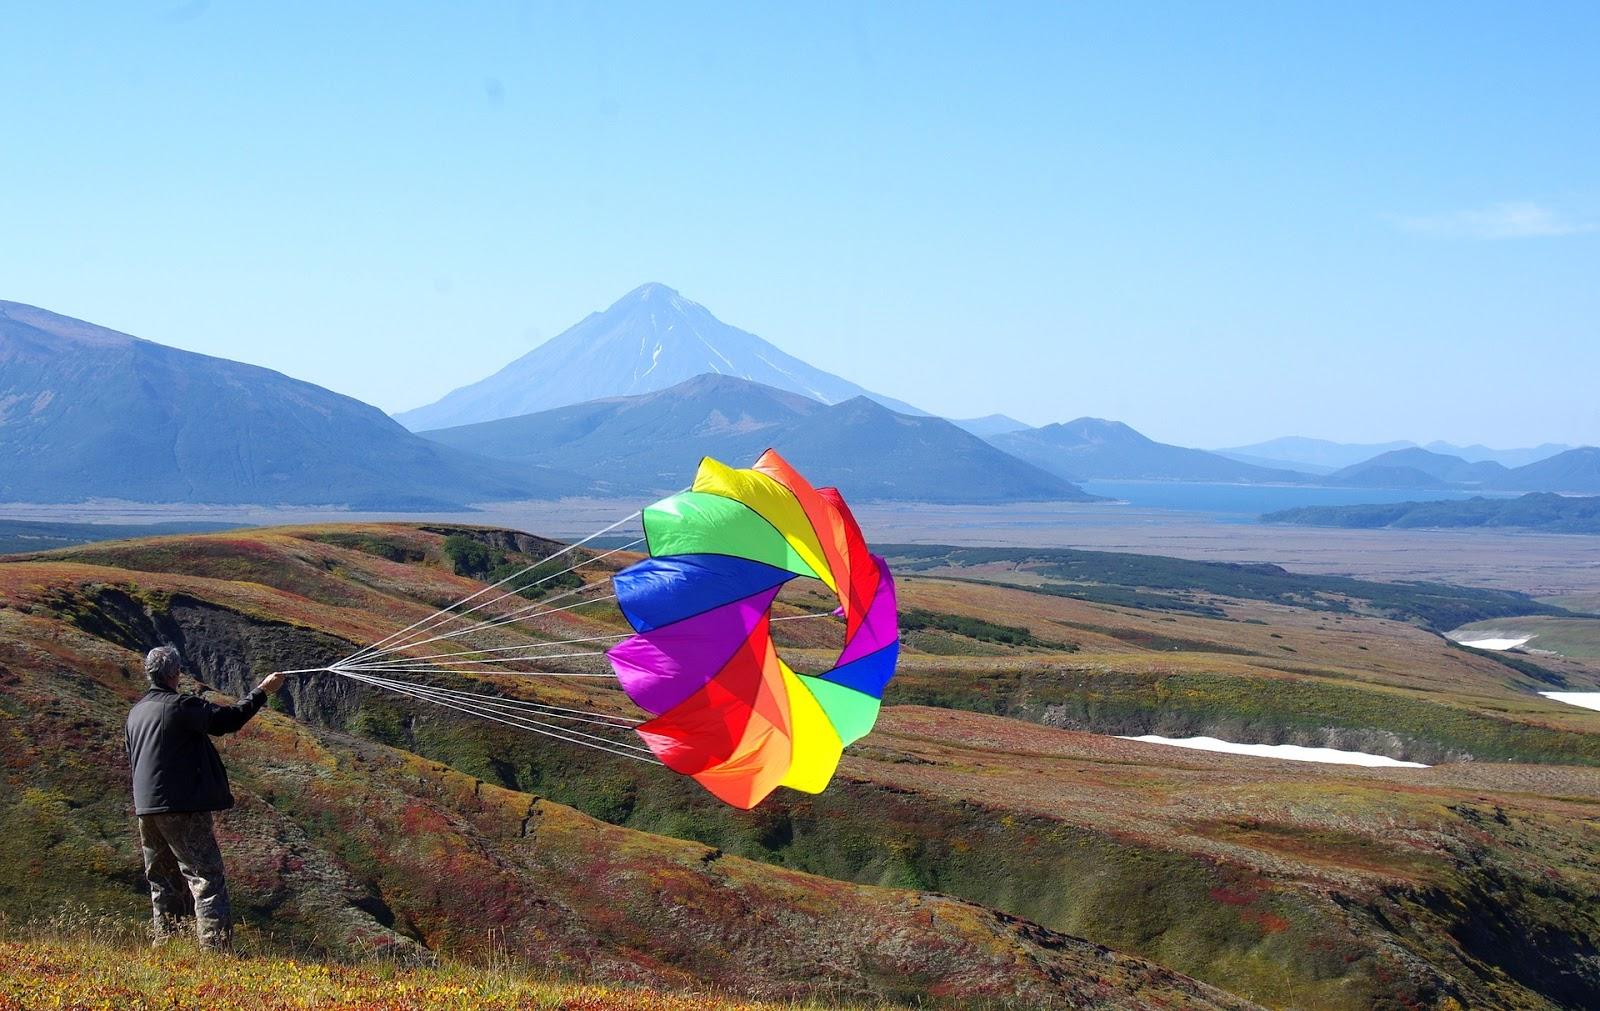 Cerpen Bahasa Inggris Tentang Persahabatan The Kite Master